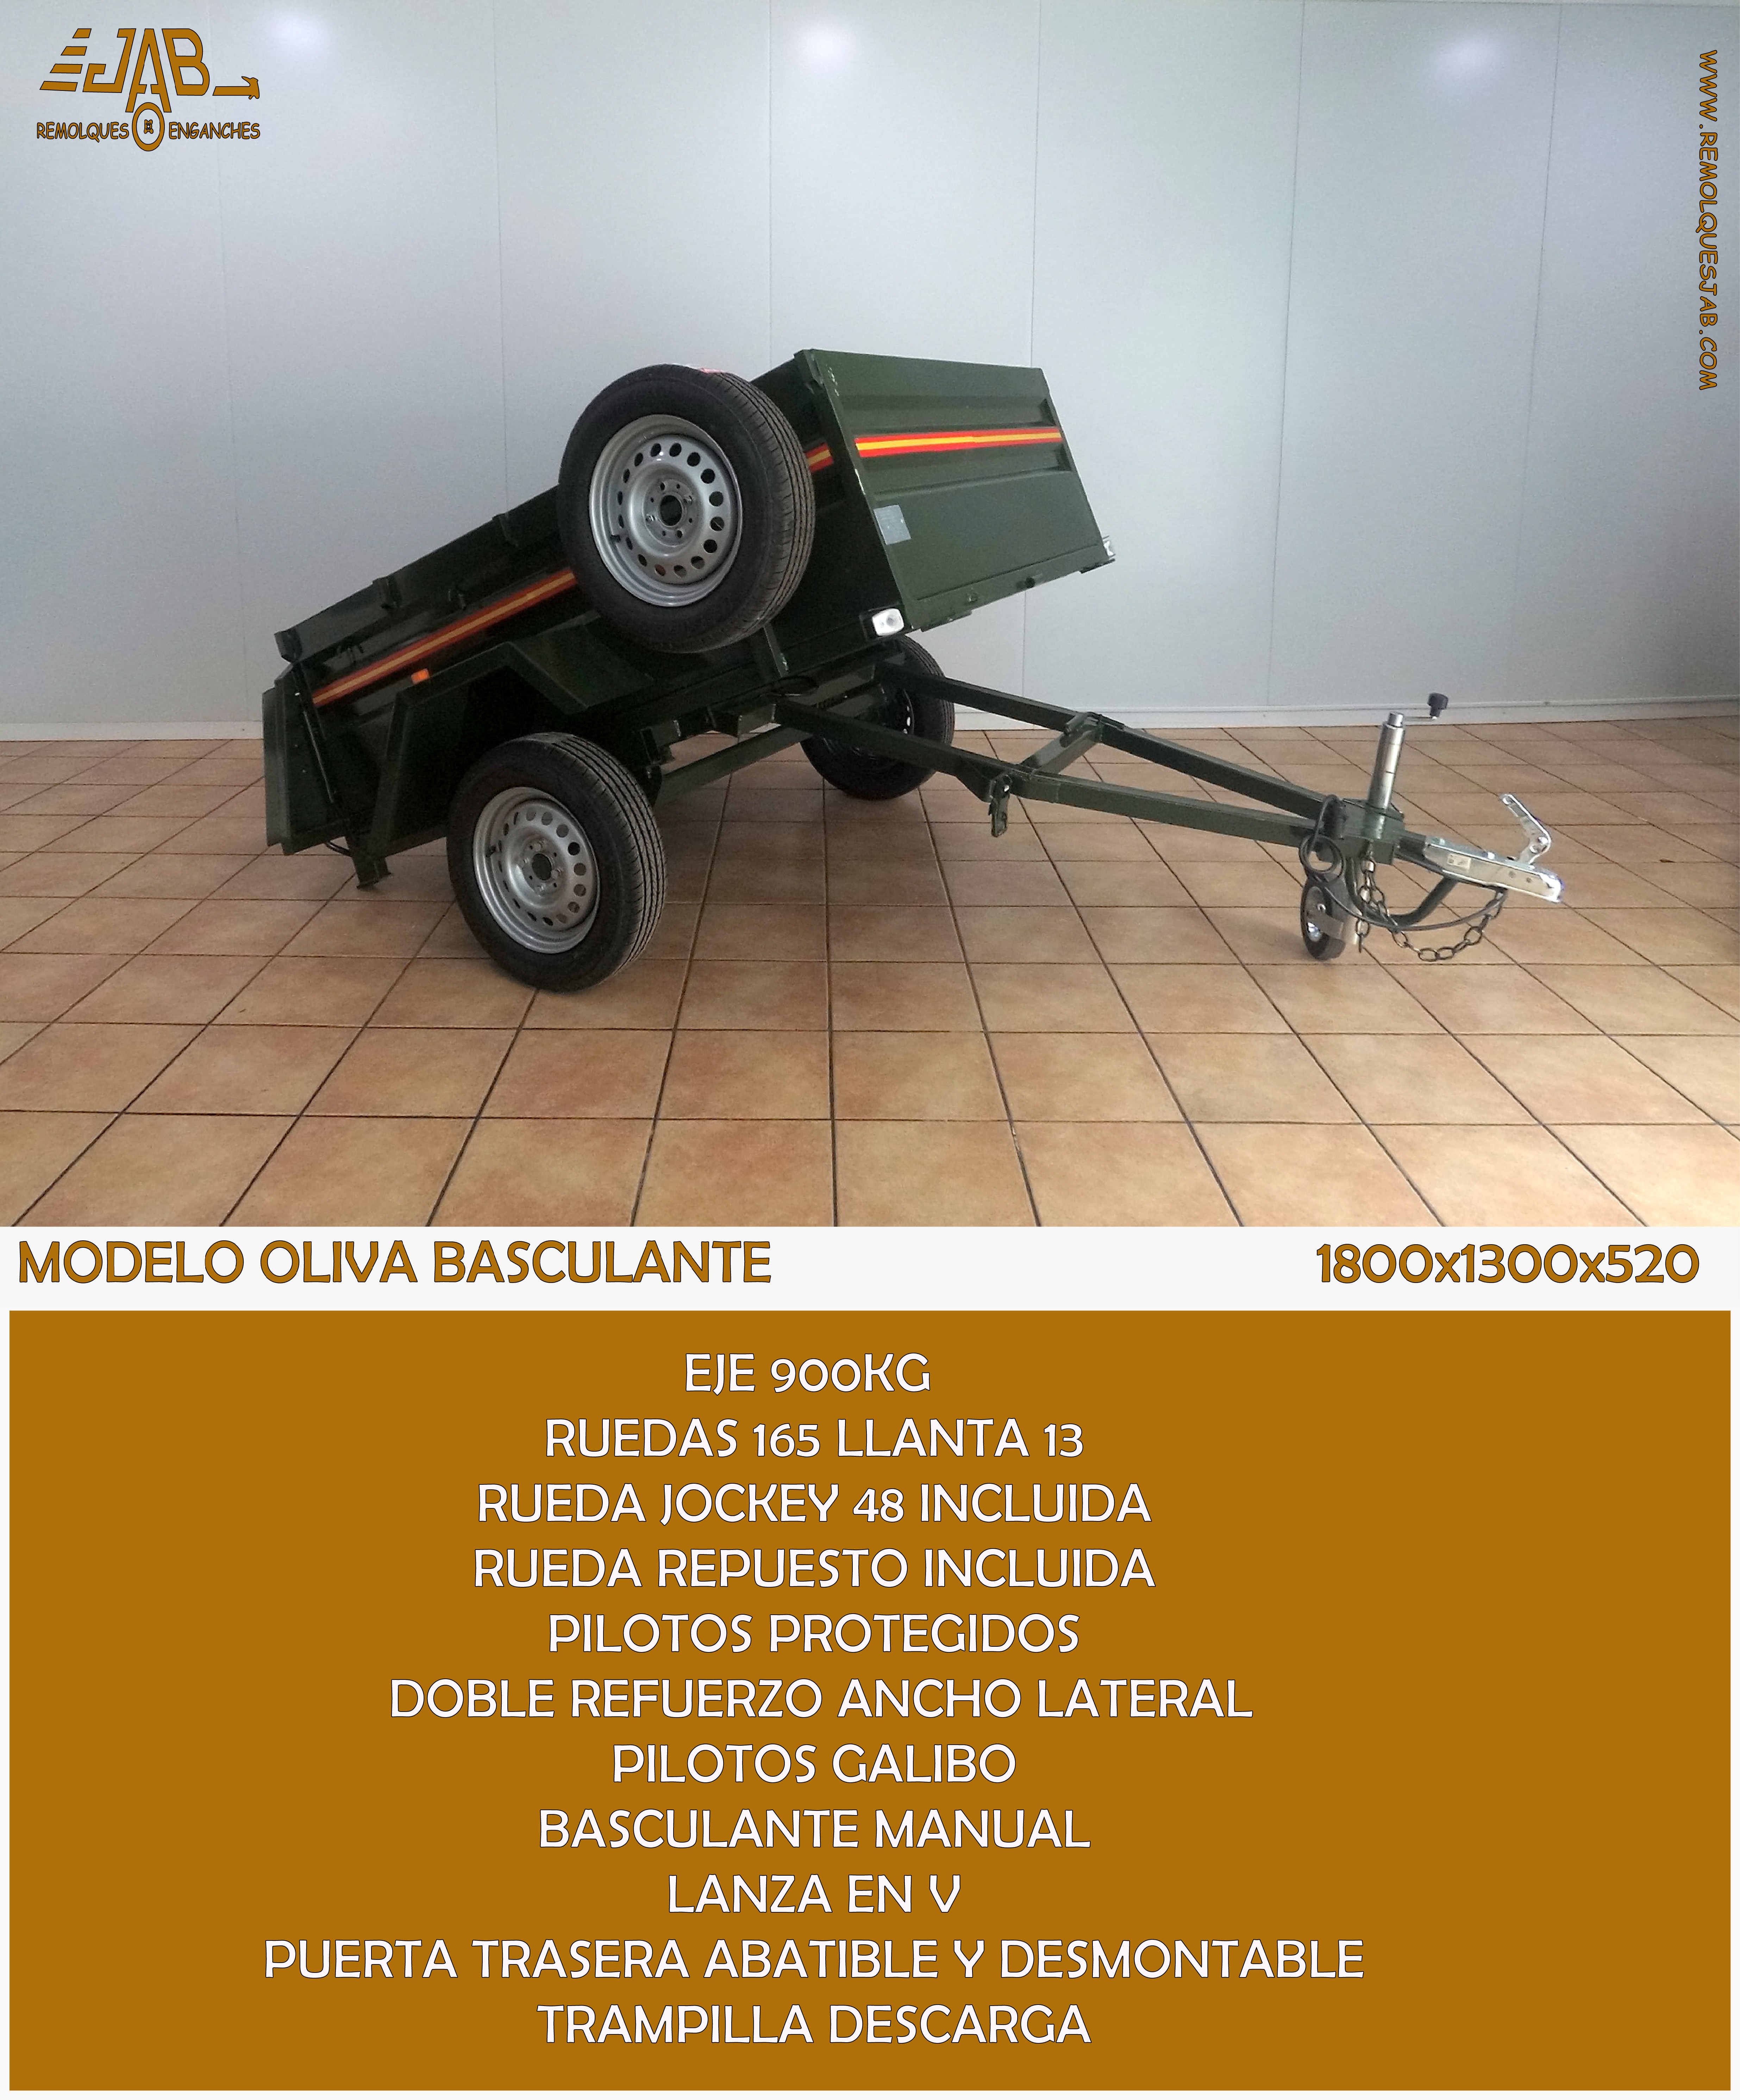 MODELO OLIVA BASCULANTE WEB